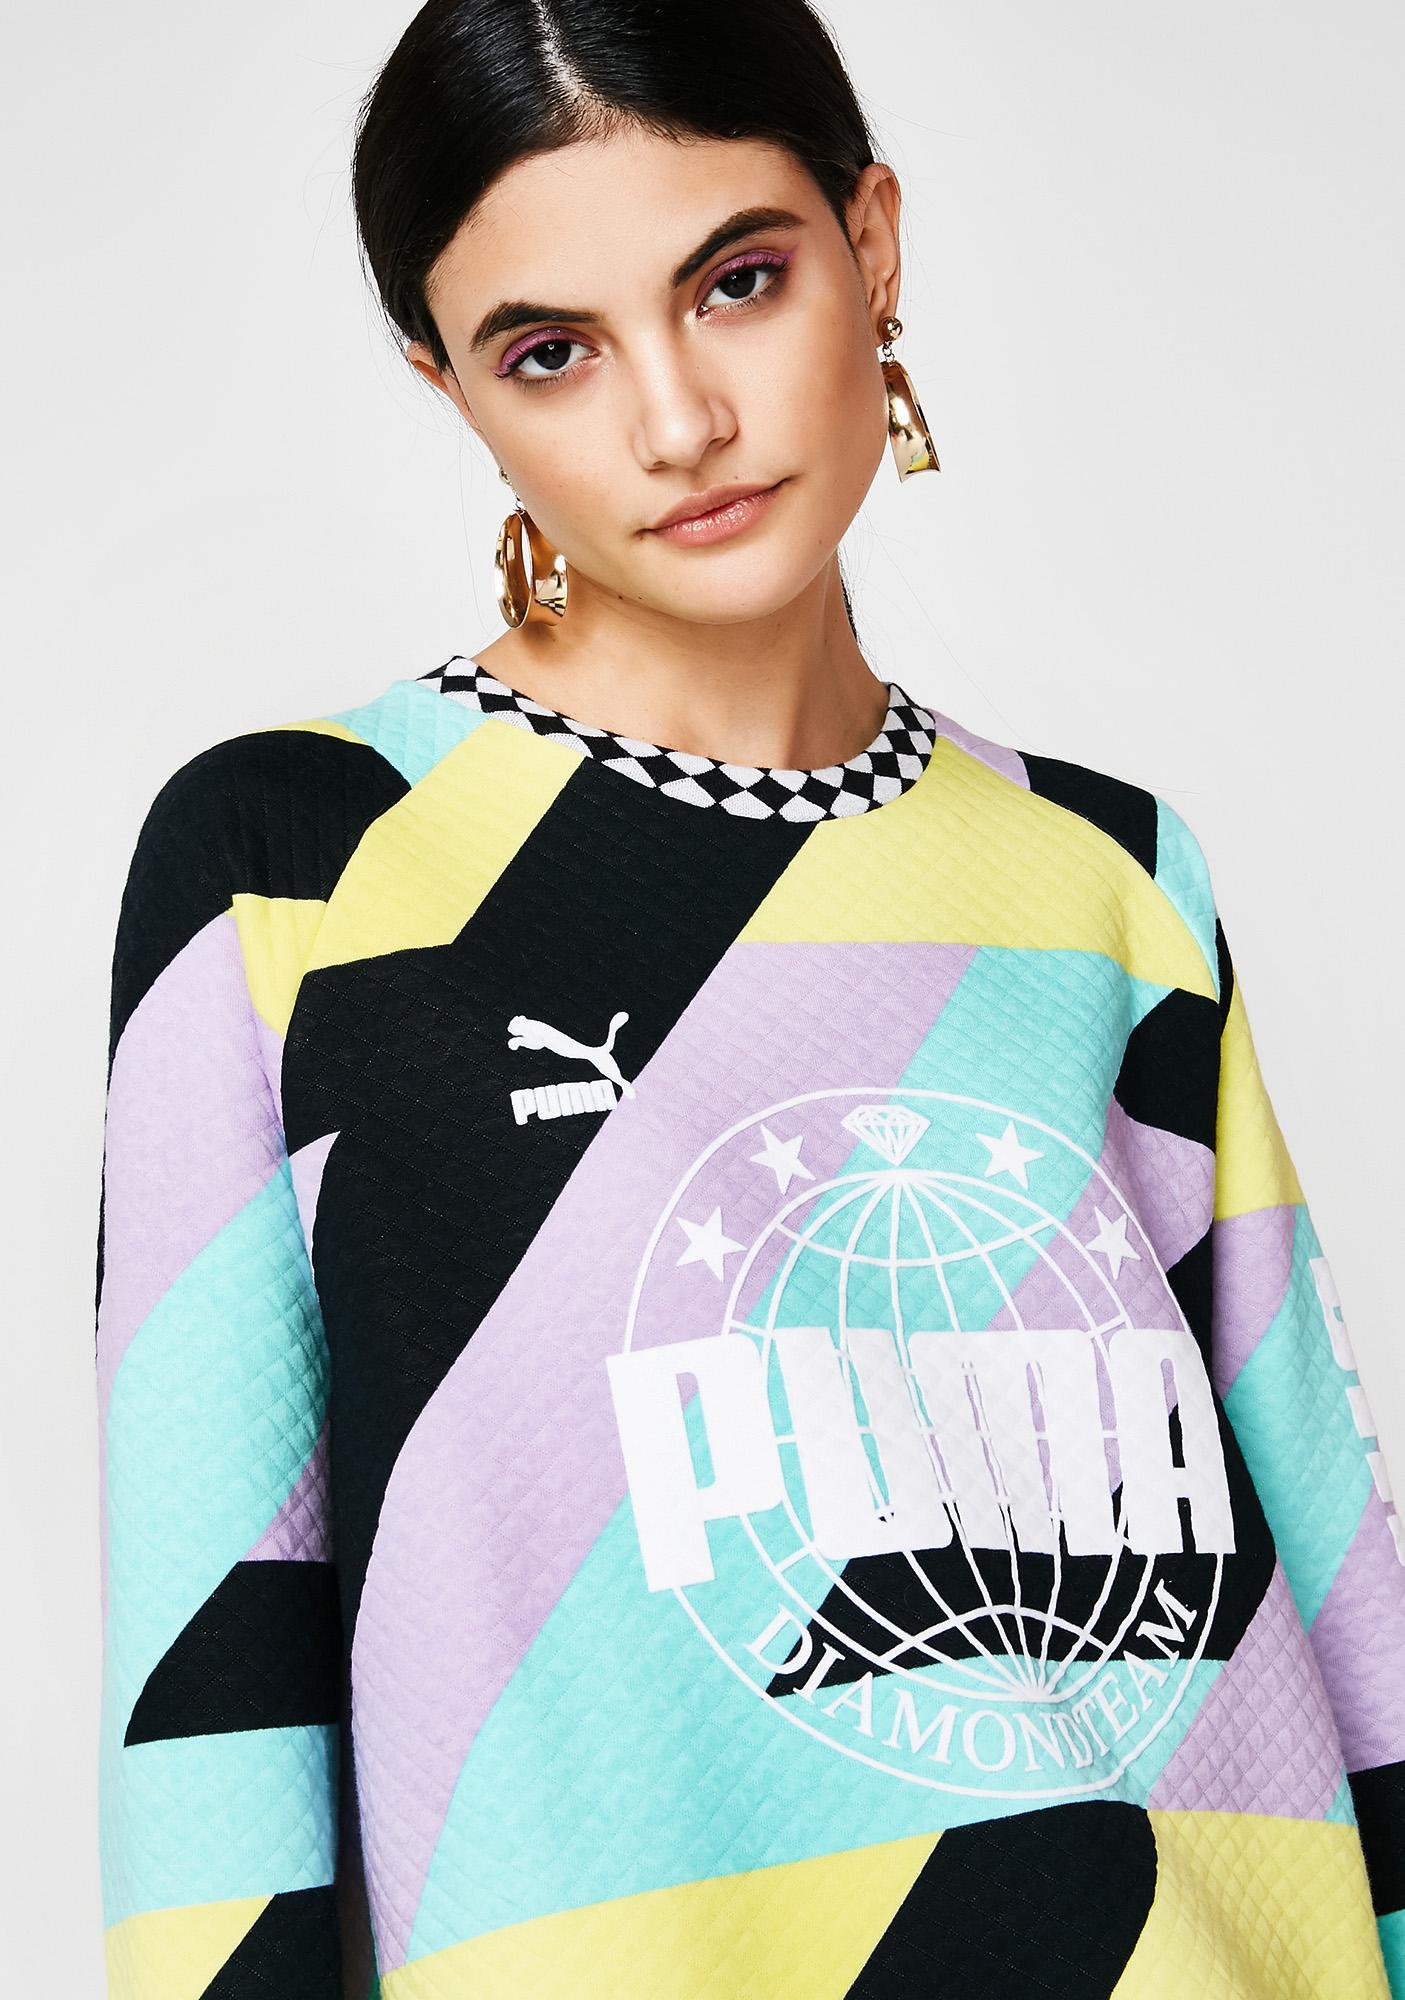 PUMA X Diamond Crew Sweatshirt